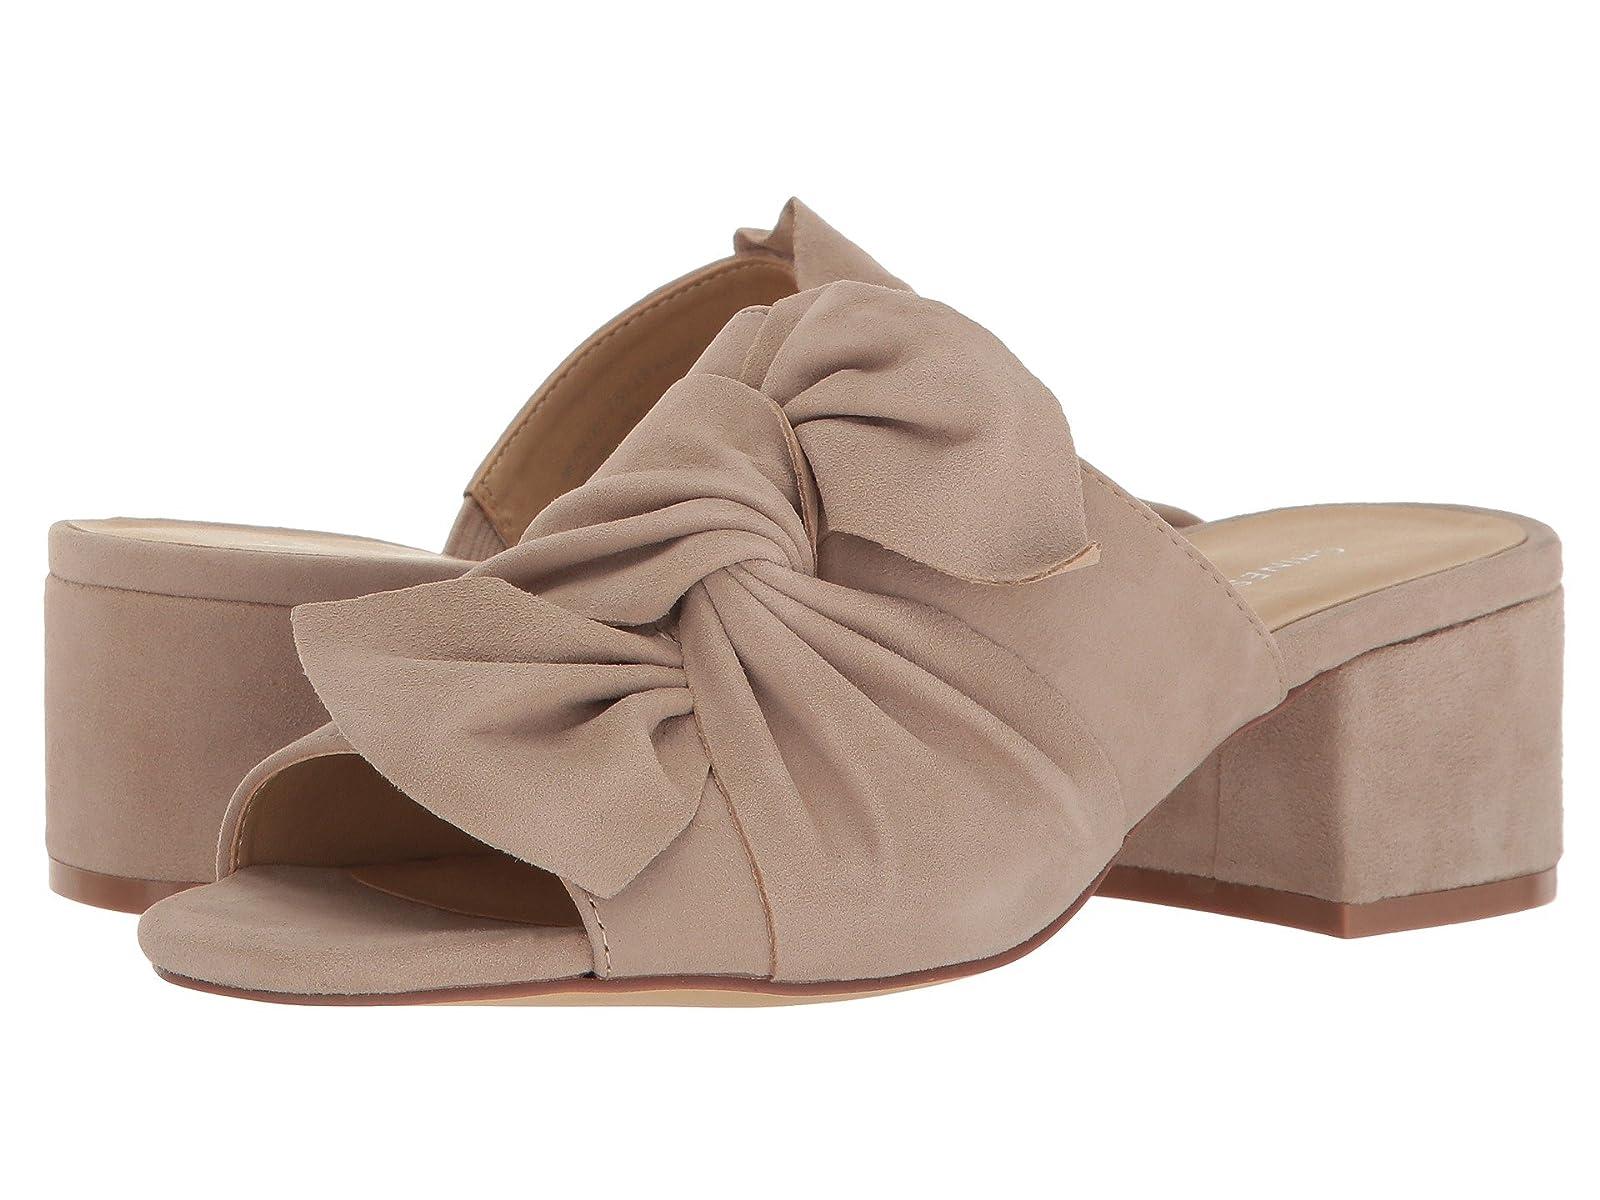 Chinese Laundry Marlowe SandalCheap and distinctive eye-catching shoes